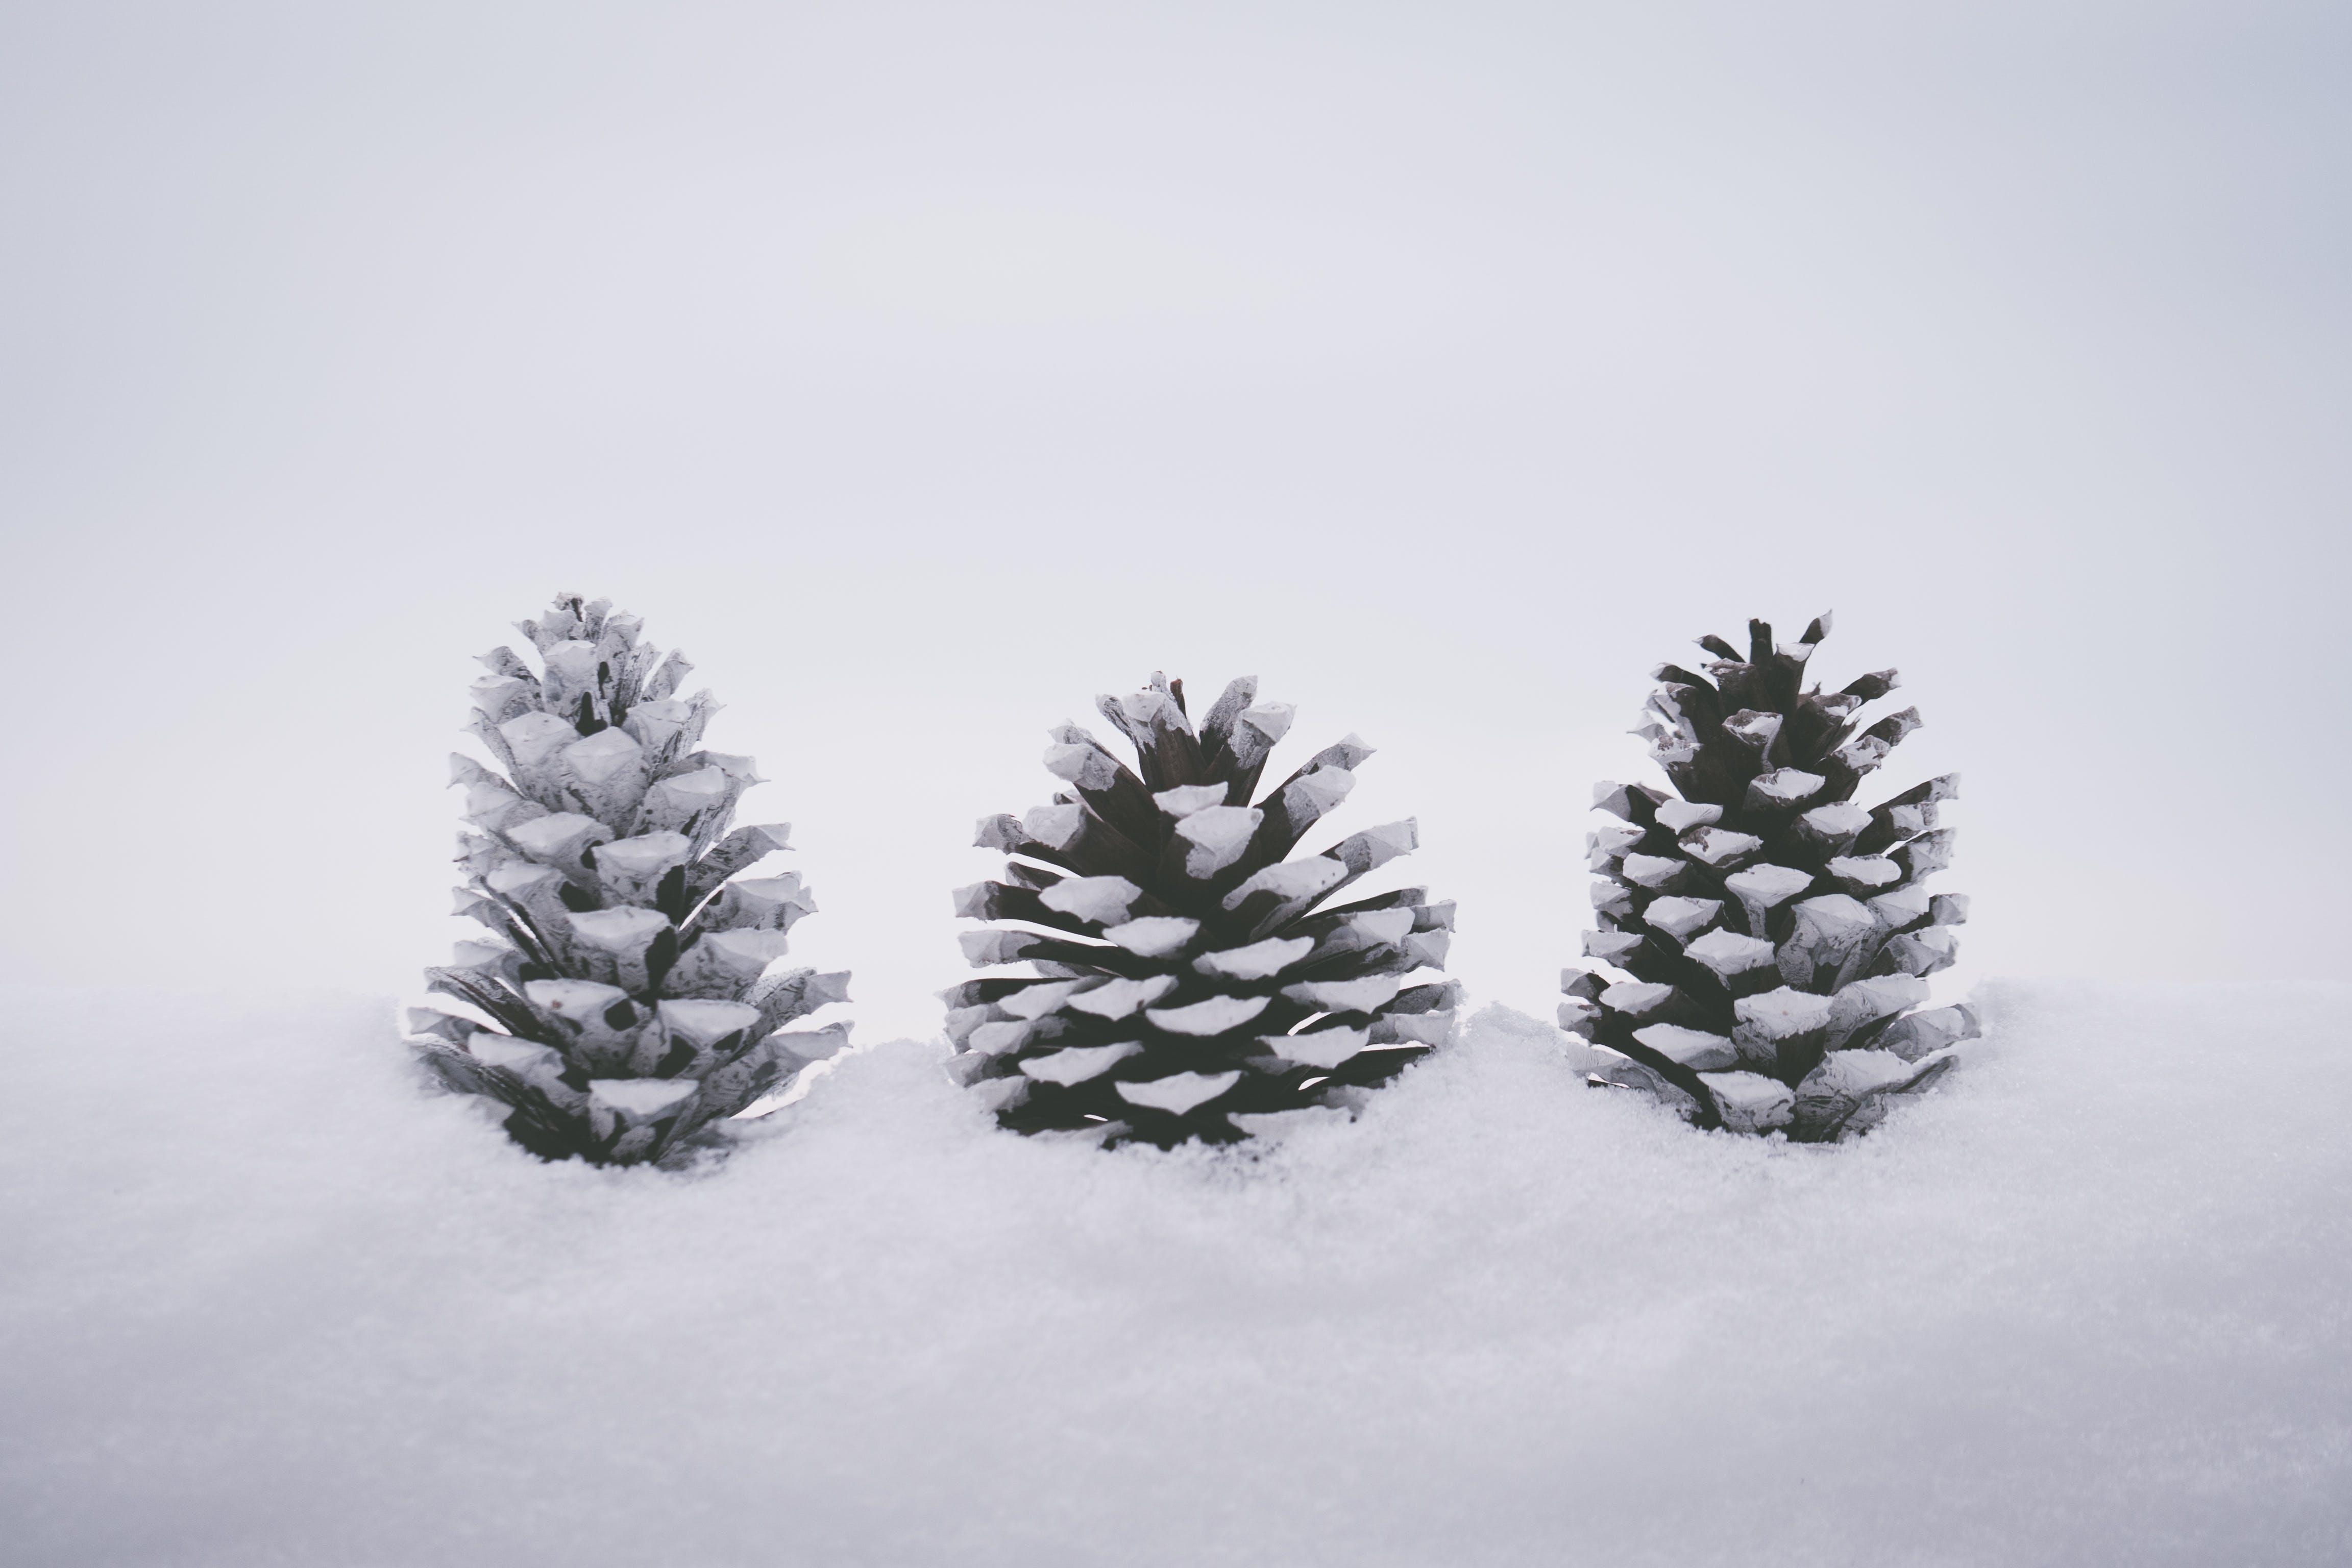 Three Pine Cones On Snow